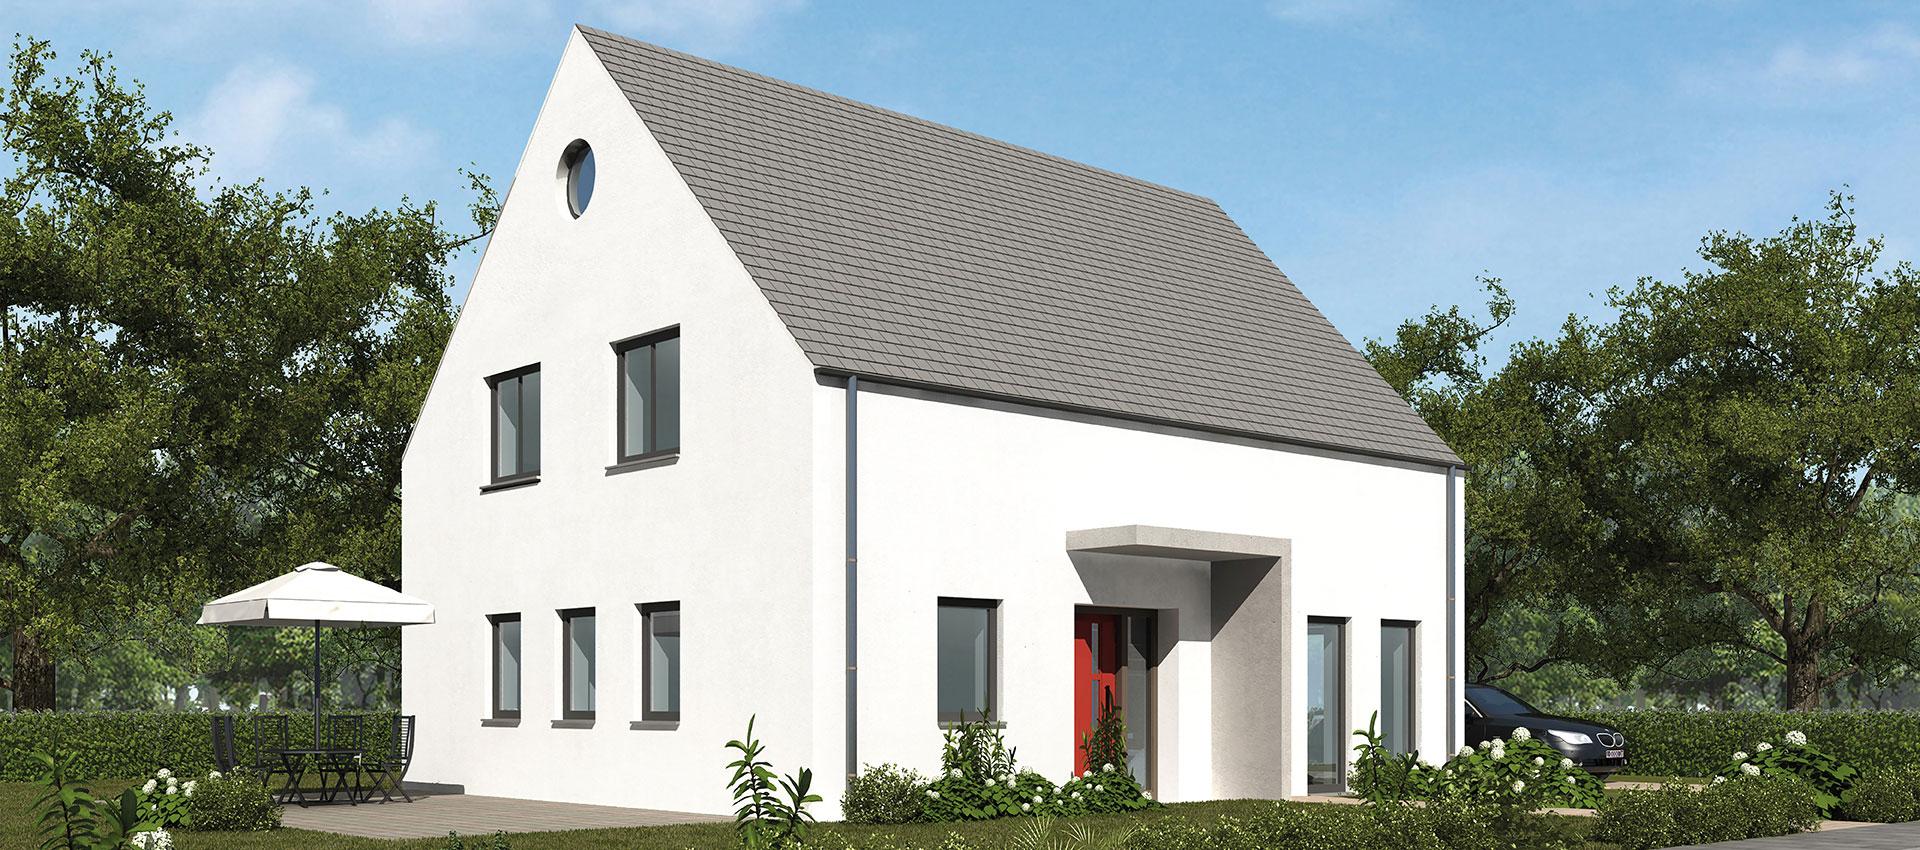 Einfamilienhaus EH 140 T